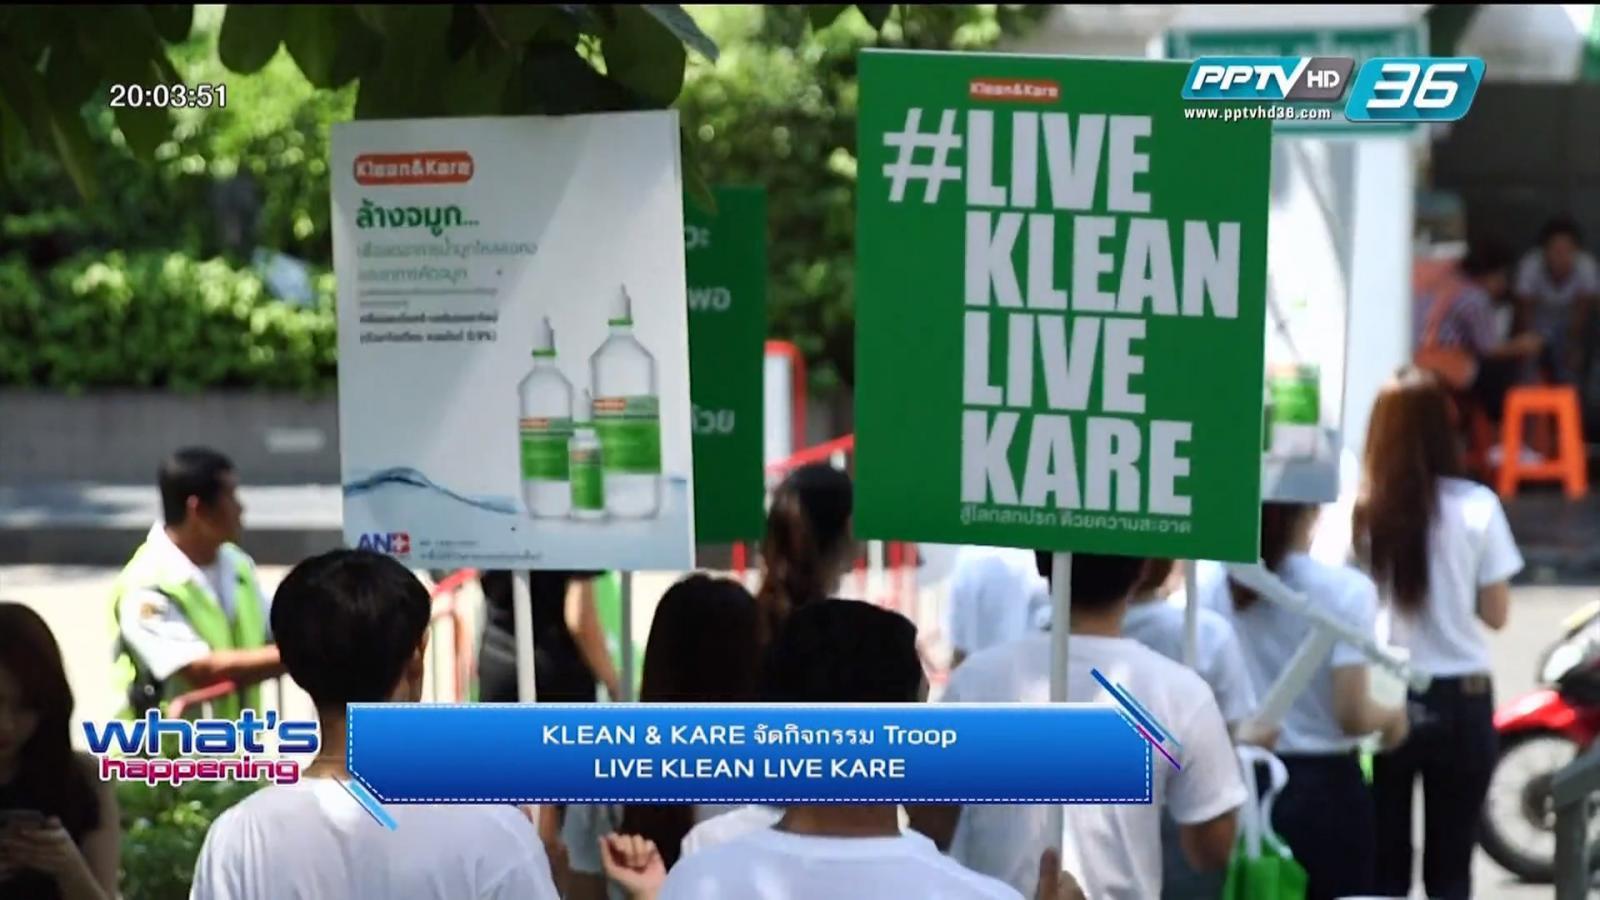 "Kean&Kare จัดกิจกรรมเดิน Troop พร้อมโปรโมทโครงการ ""LIVE KLEAN LIVE KARE"""